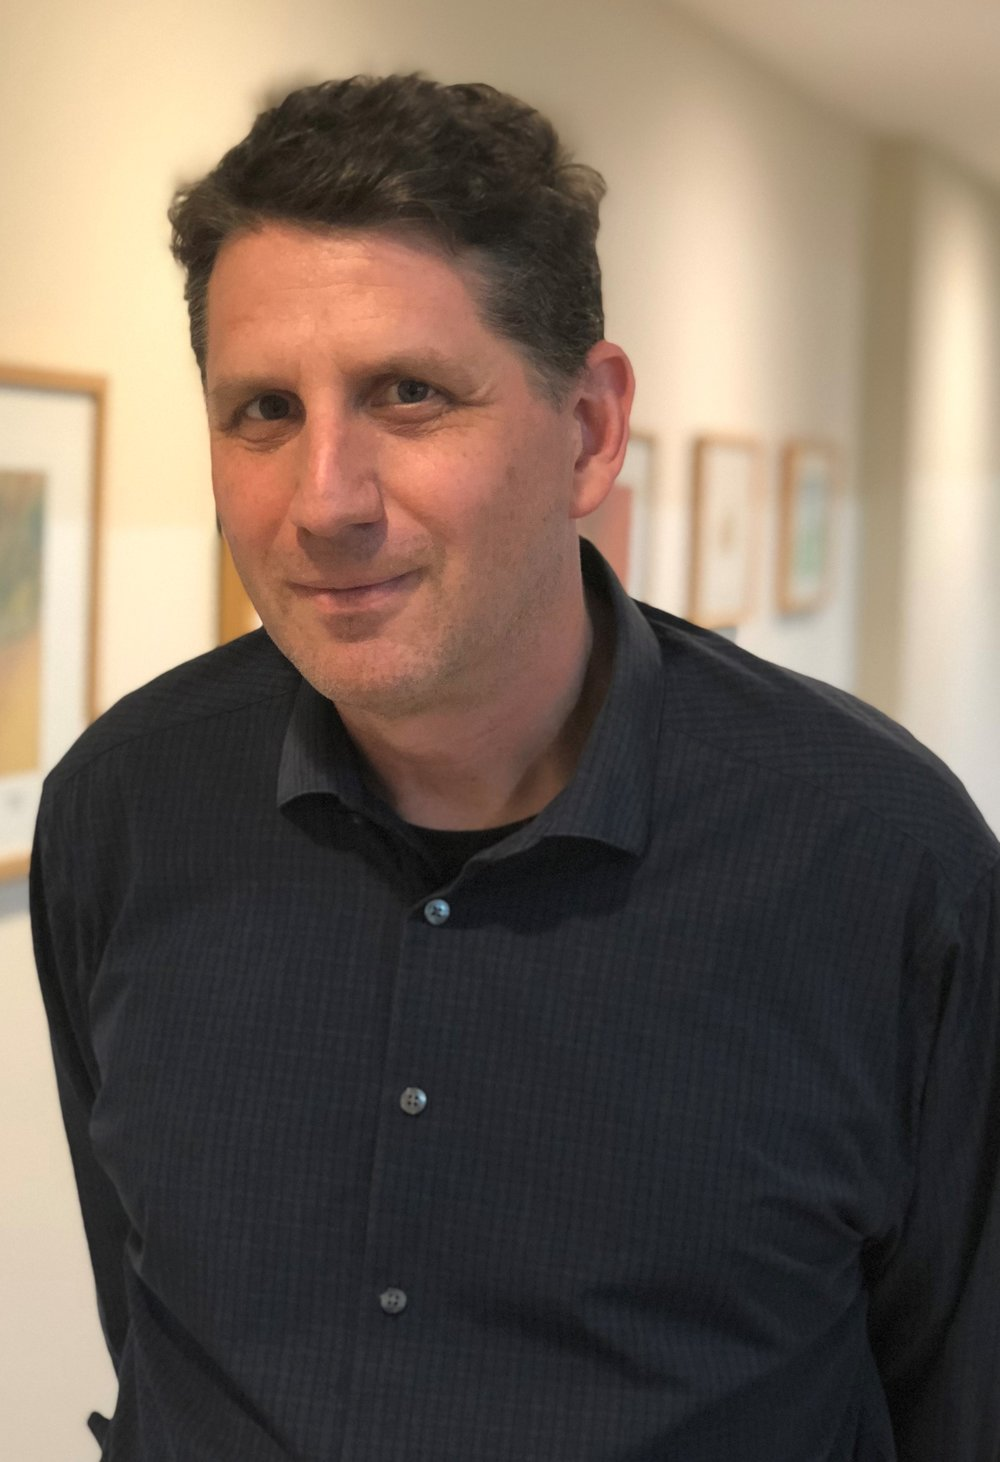 Chris Gerolimatos